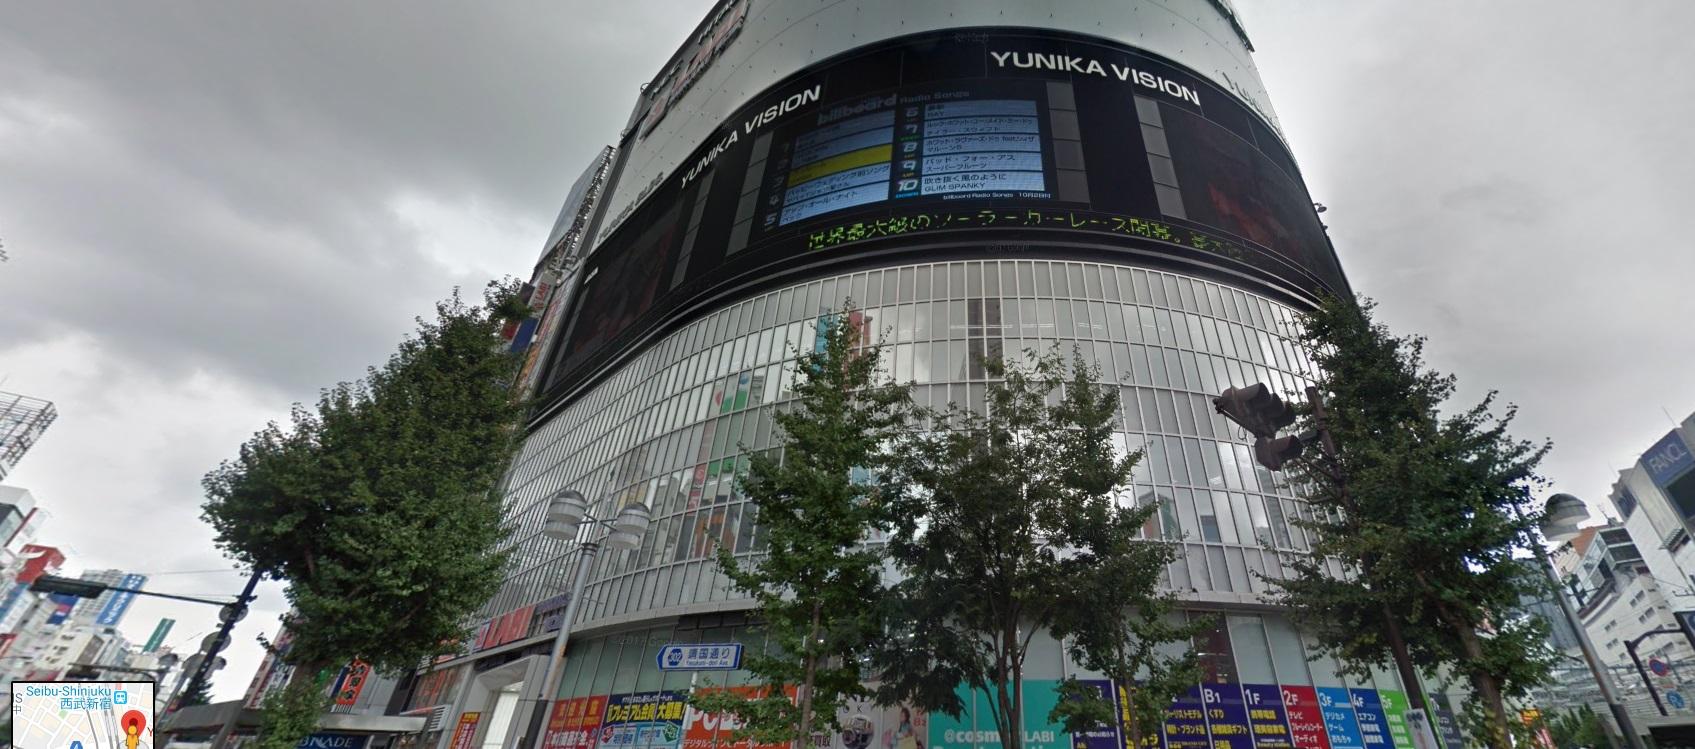 yunika vision